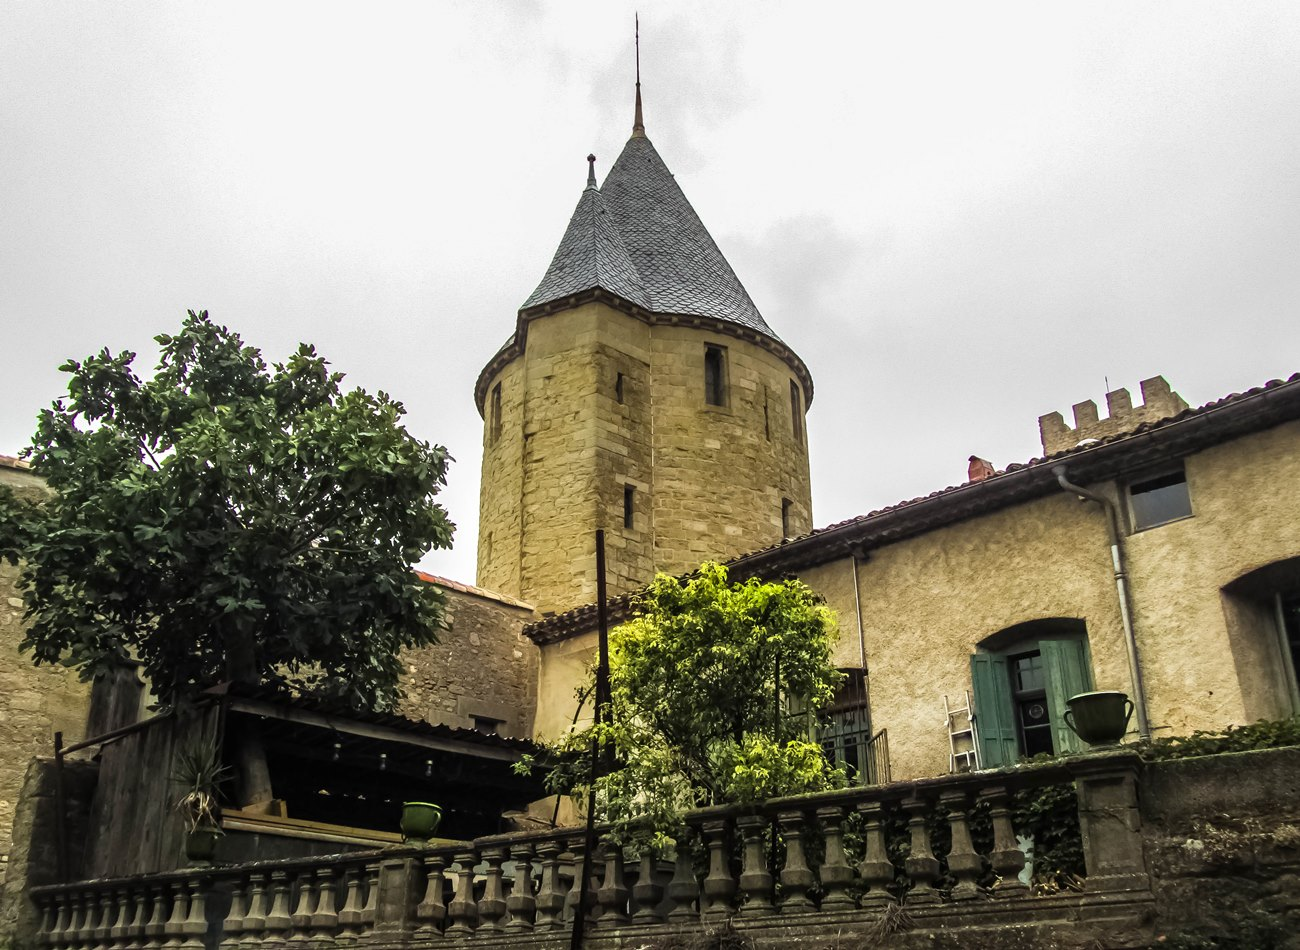 irina-fortuna-Carcassonne-france 14.jpg